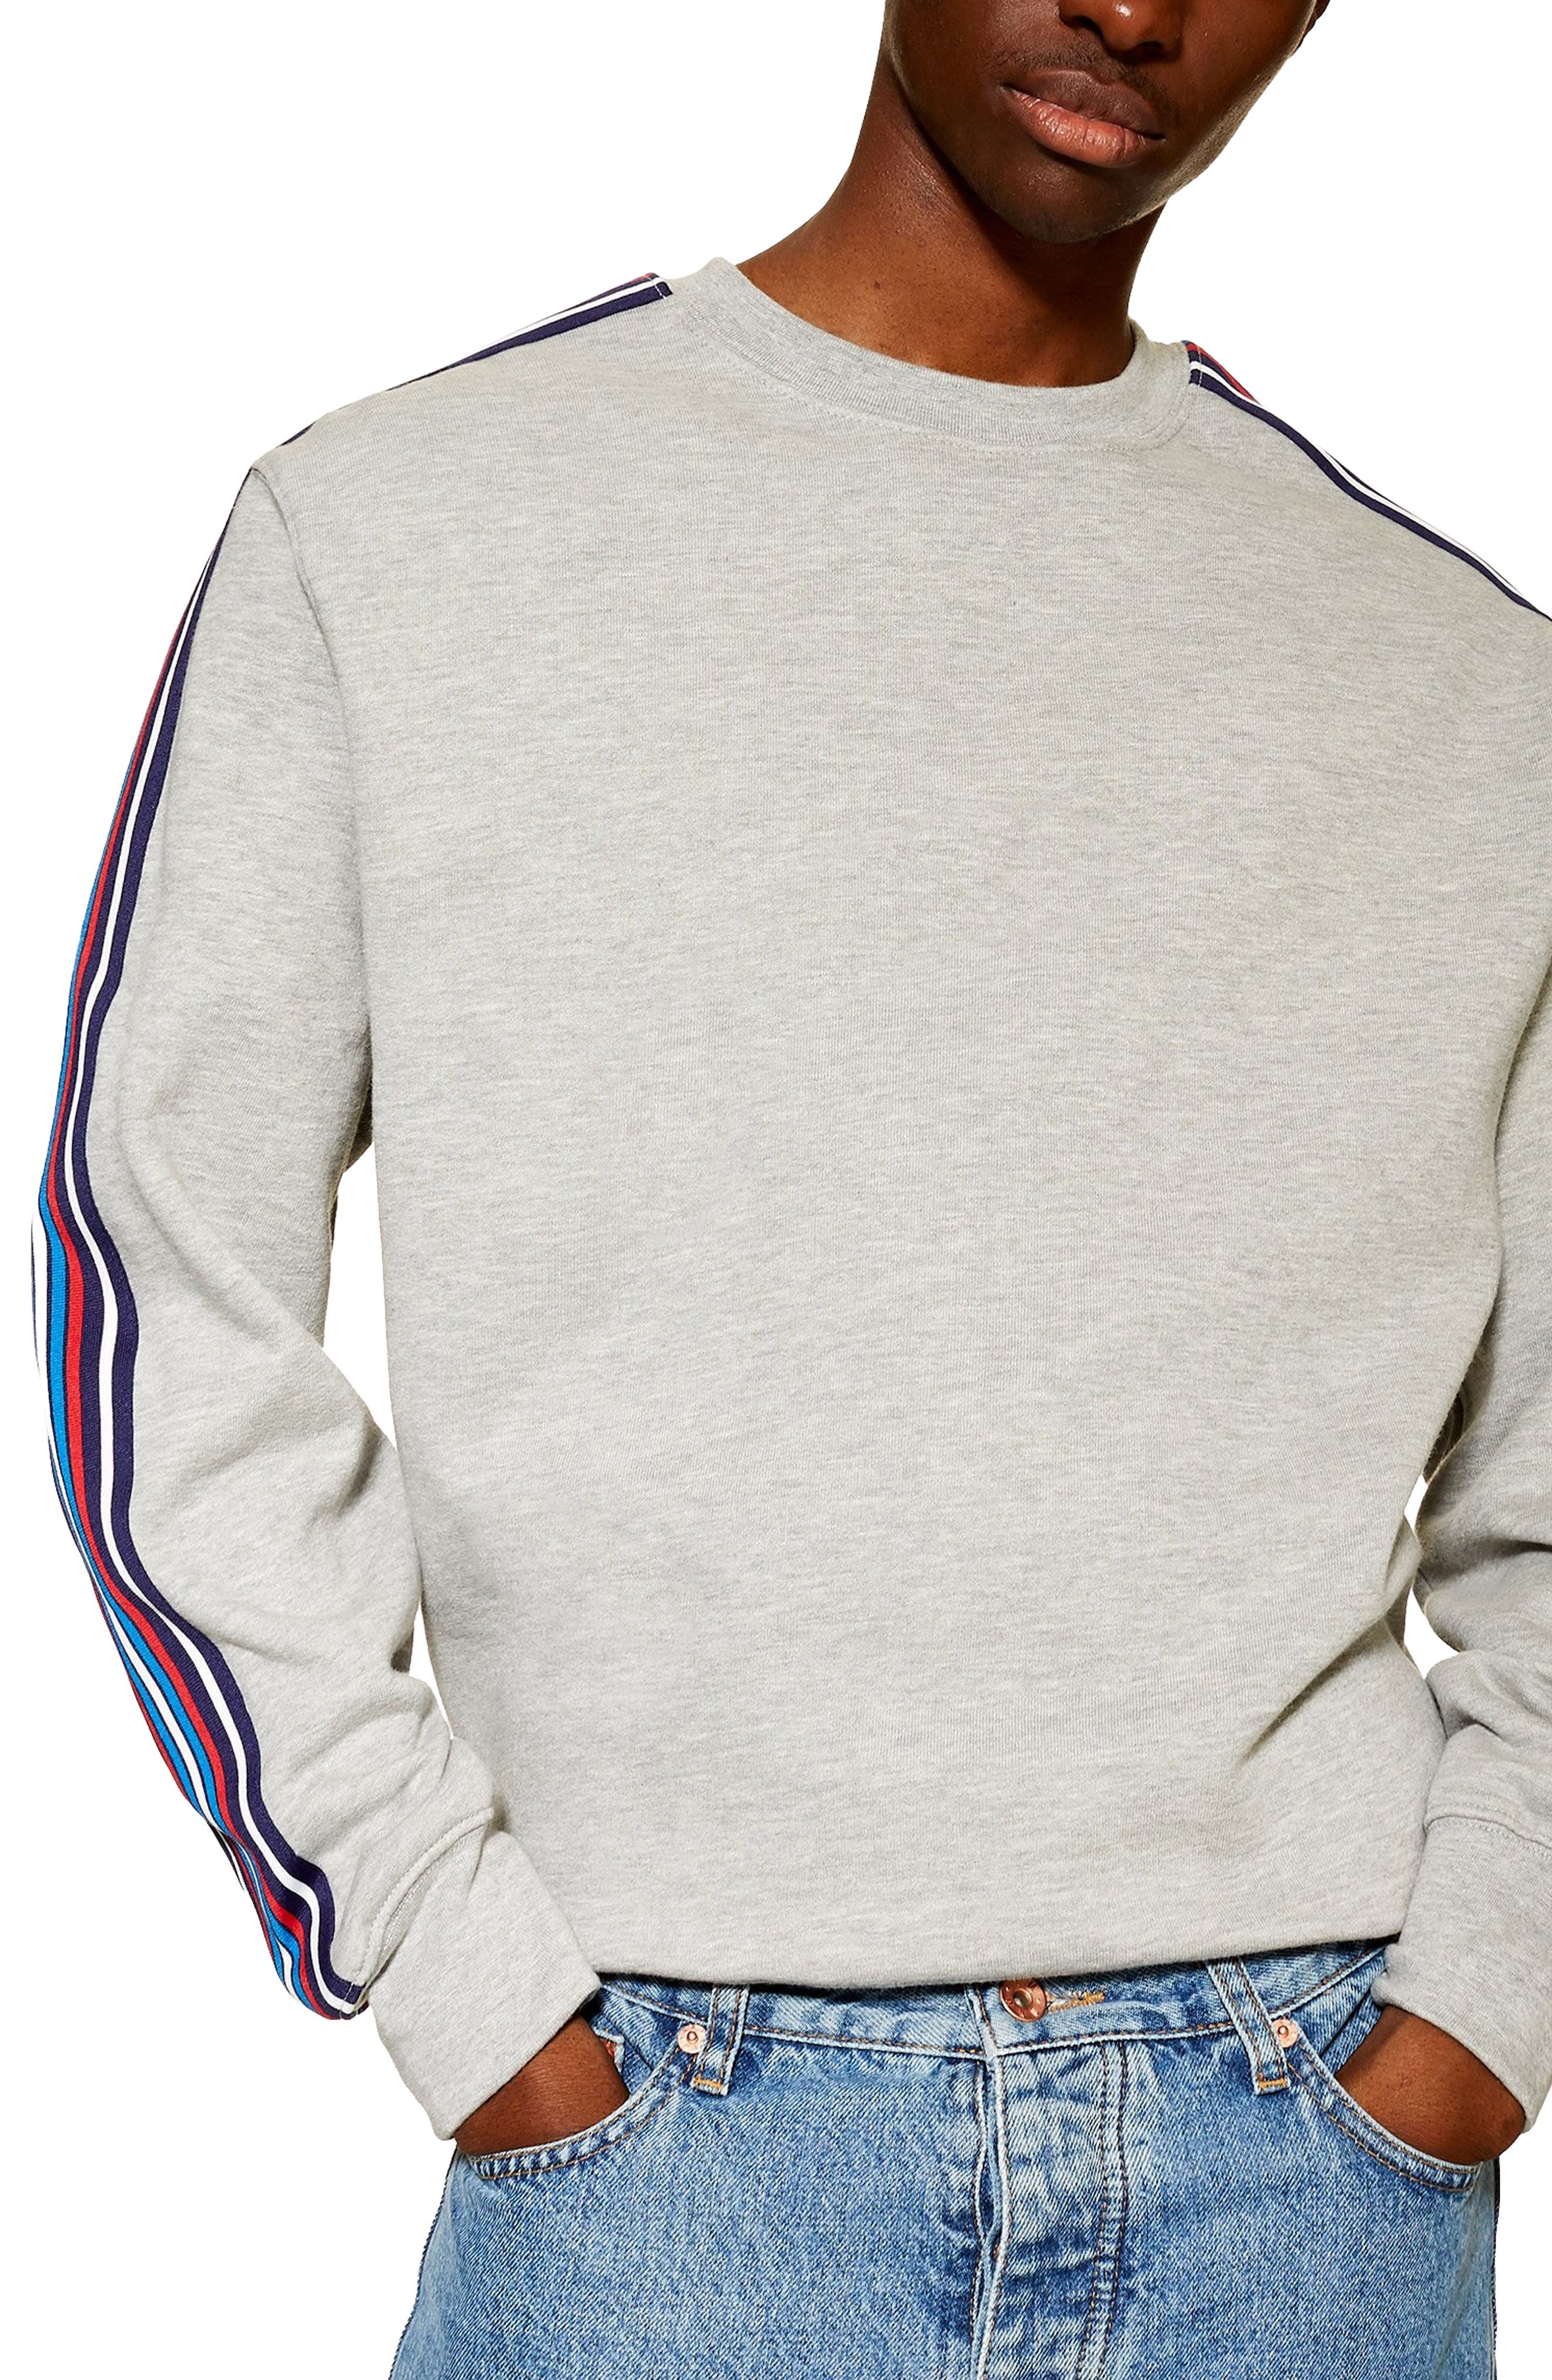 TOPMAN Tape Crewneck Sweatshirt, Main, color, LIGHT GREY